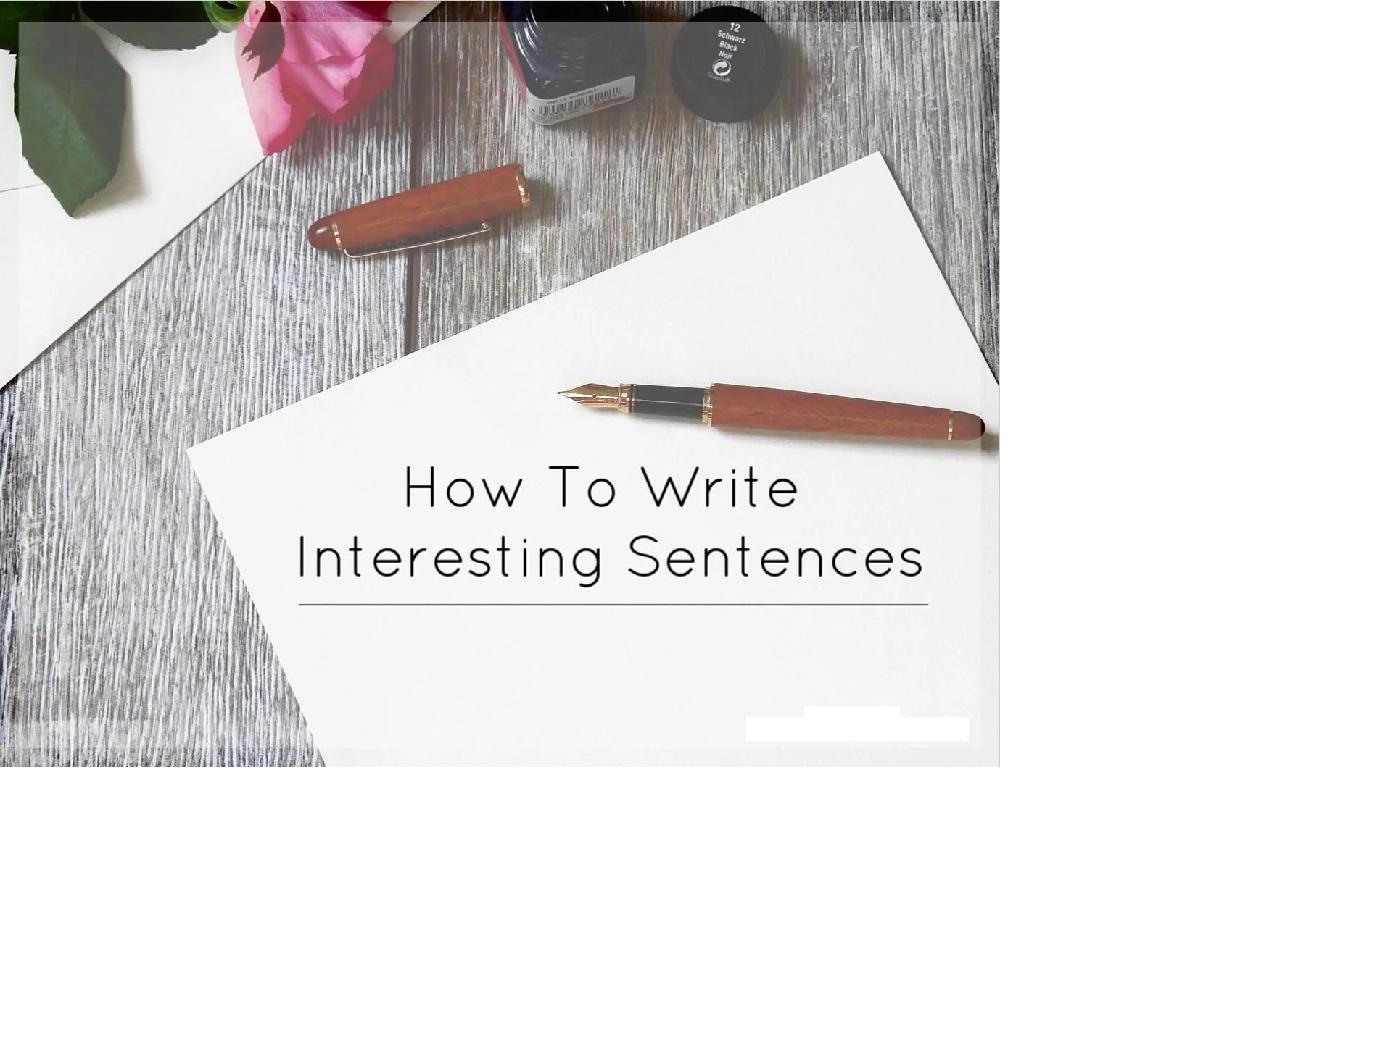 How to Write Interesting Sentences